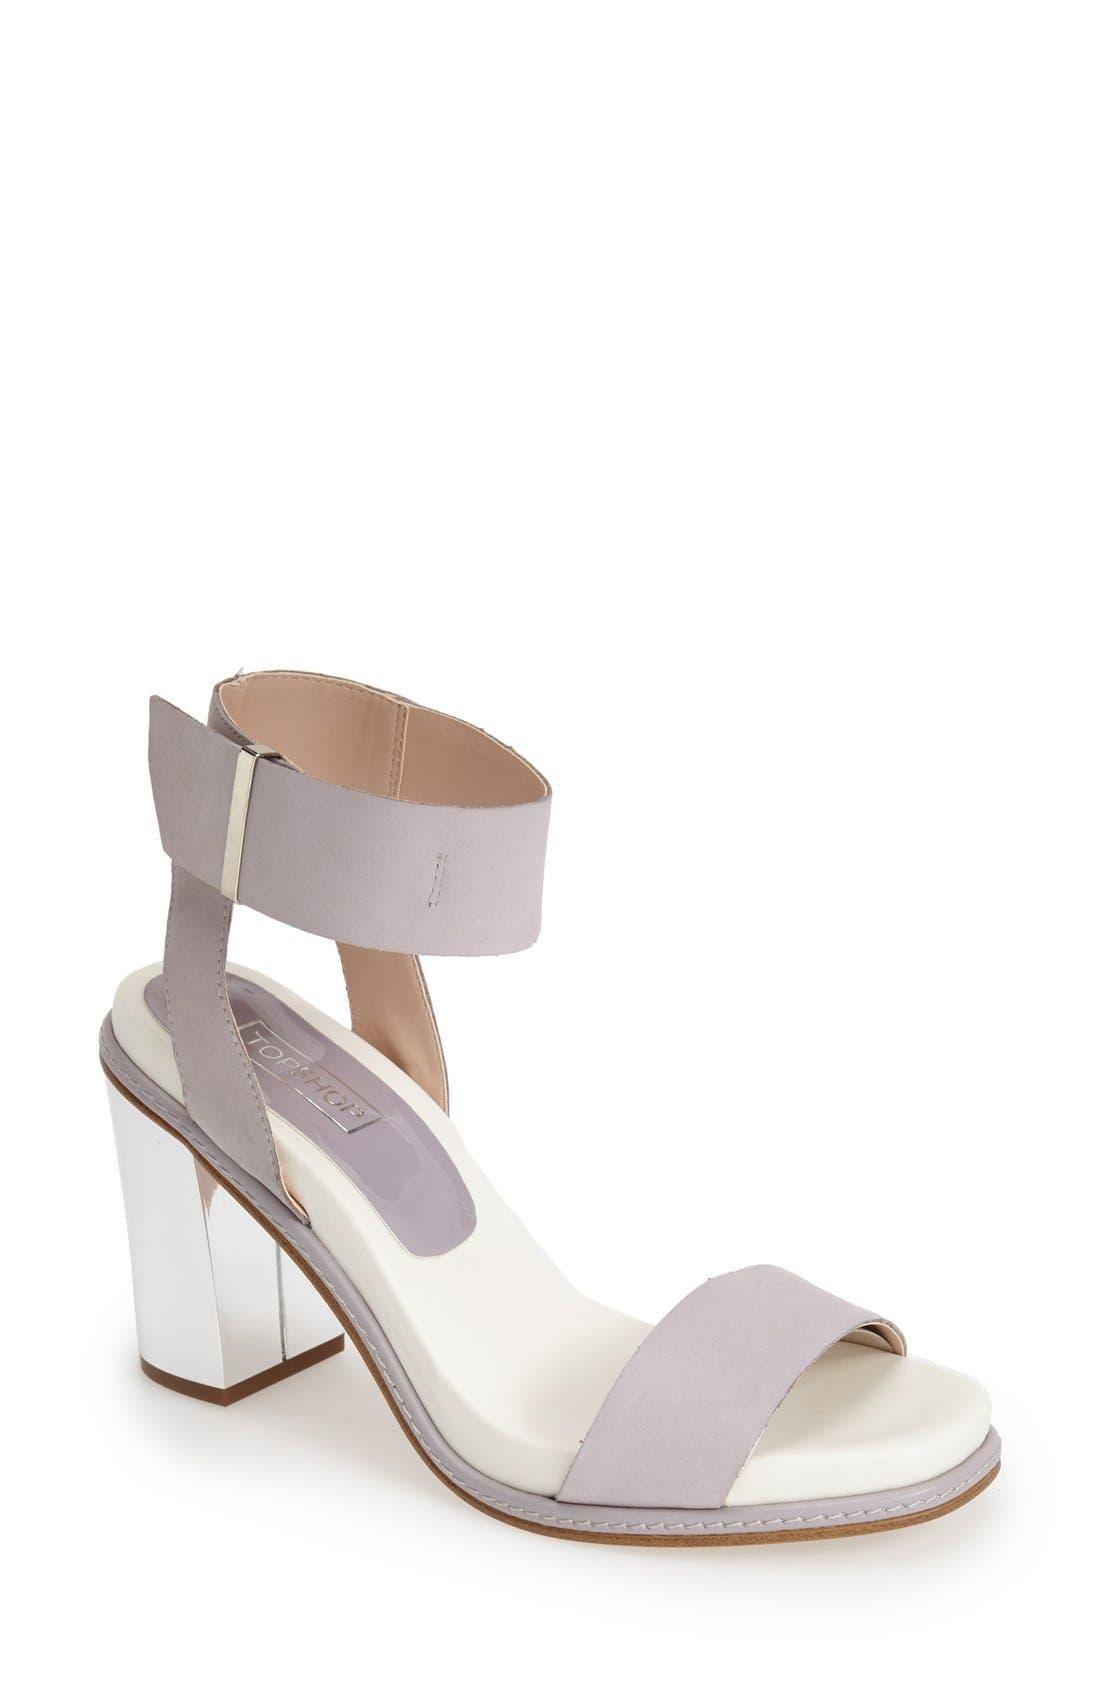 Alternate Image 1 Selected - Topshop 'Reflect' Metallic Heel Leather Sandal (Women)